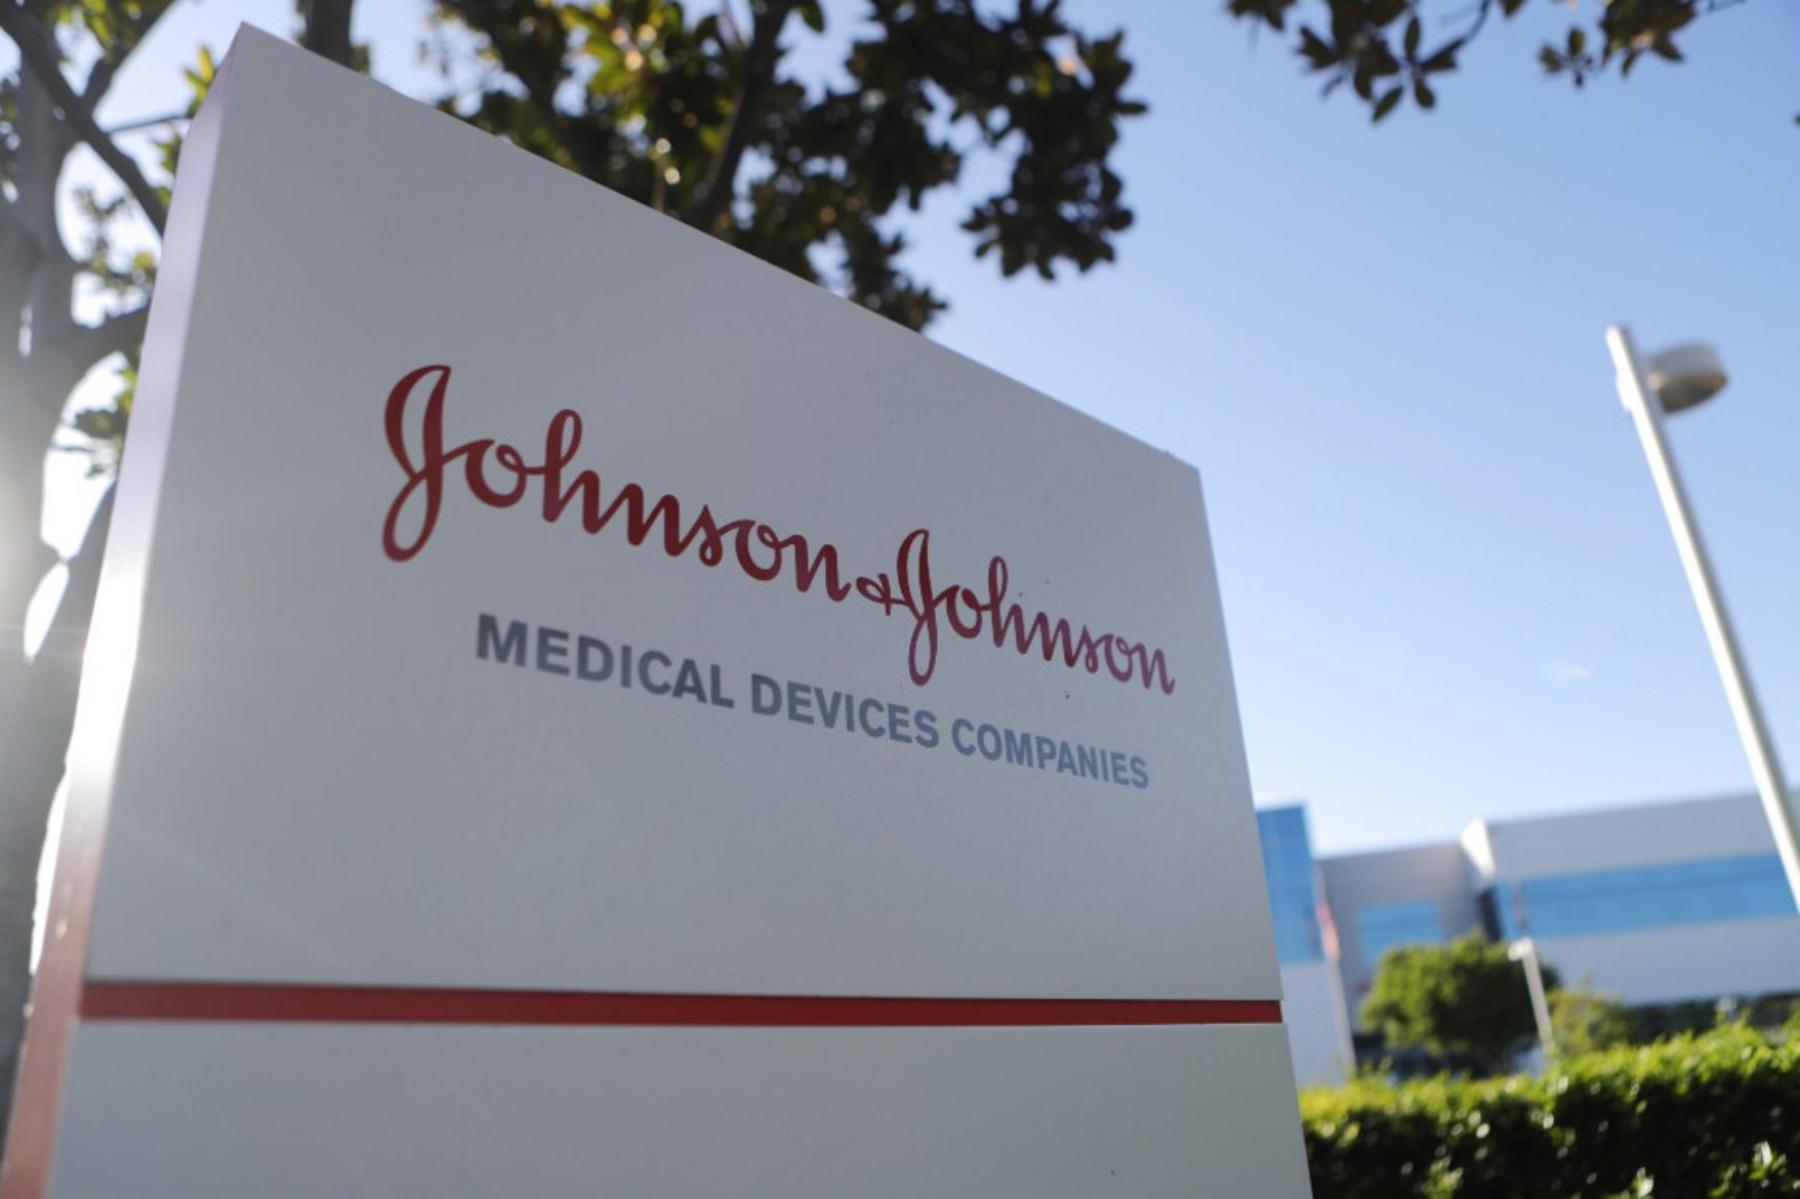 Johnson & Johnson: Χρυσό και Αργυρό Βραβείο για την Johnson & Johnson σταHealth & Safety Awards 2021